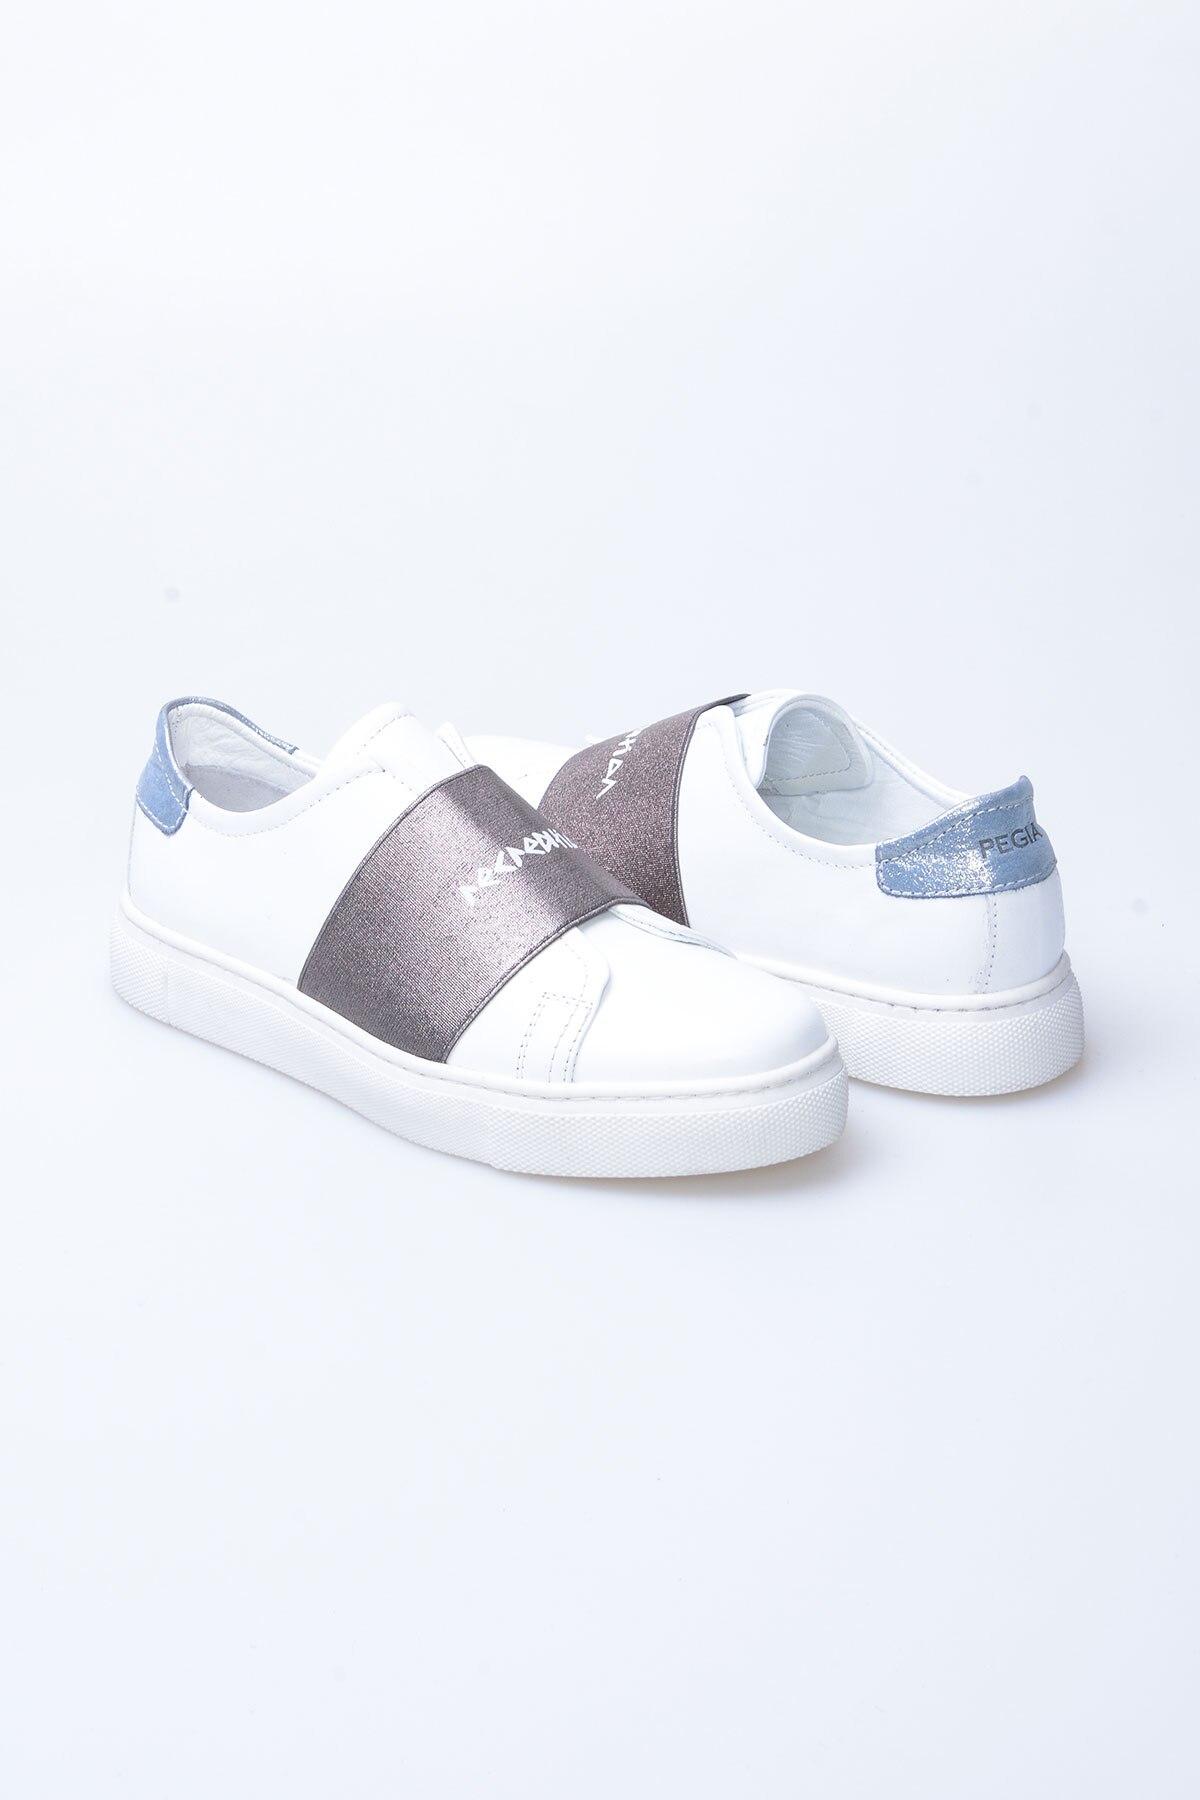 Кроссовки Женские Leather Sneakers Women Женская Обувь Кеды Женские Made In Turkey Zapatillas Mujer Слипоны Baskets Femme Shoes